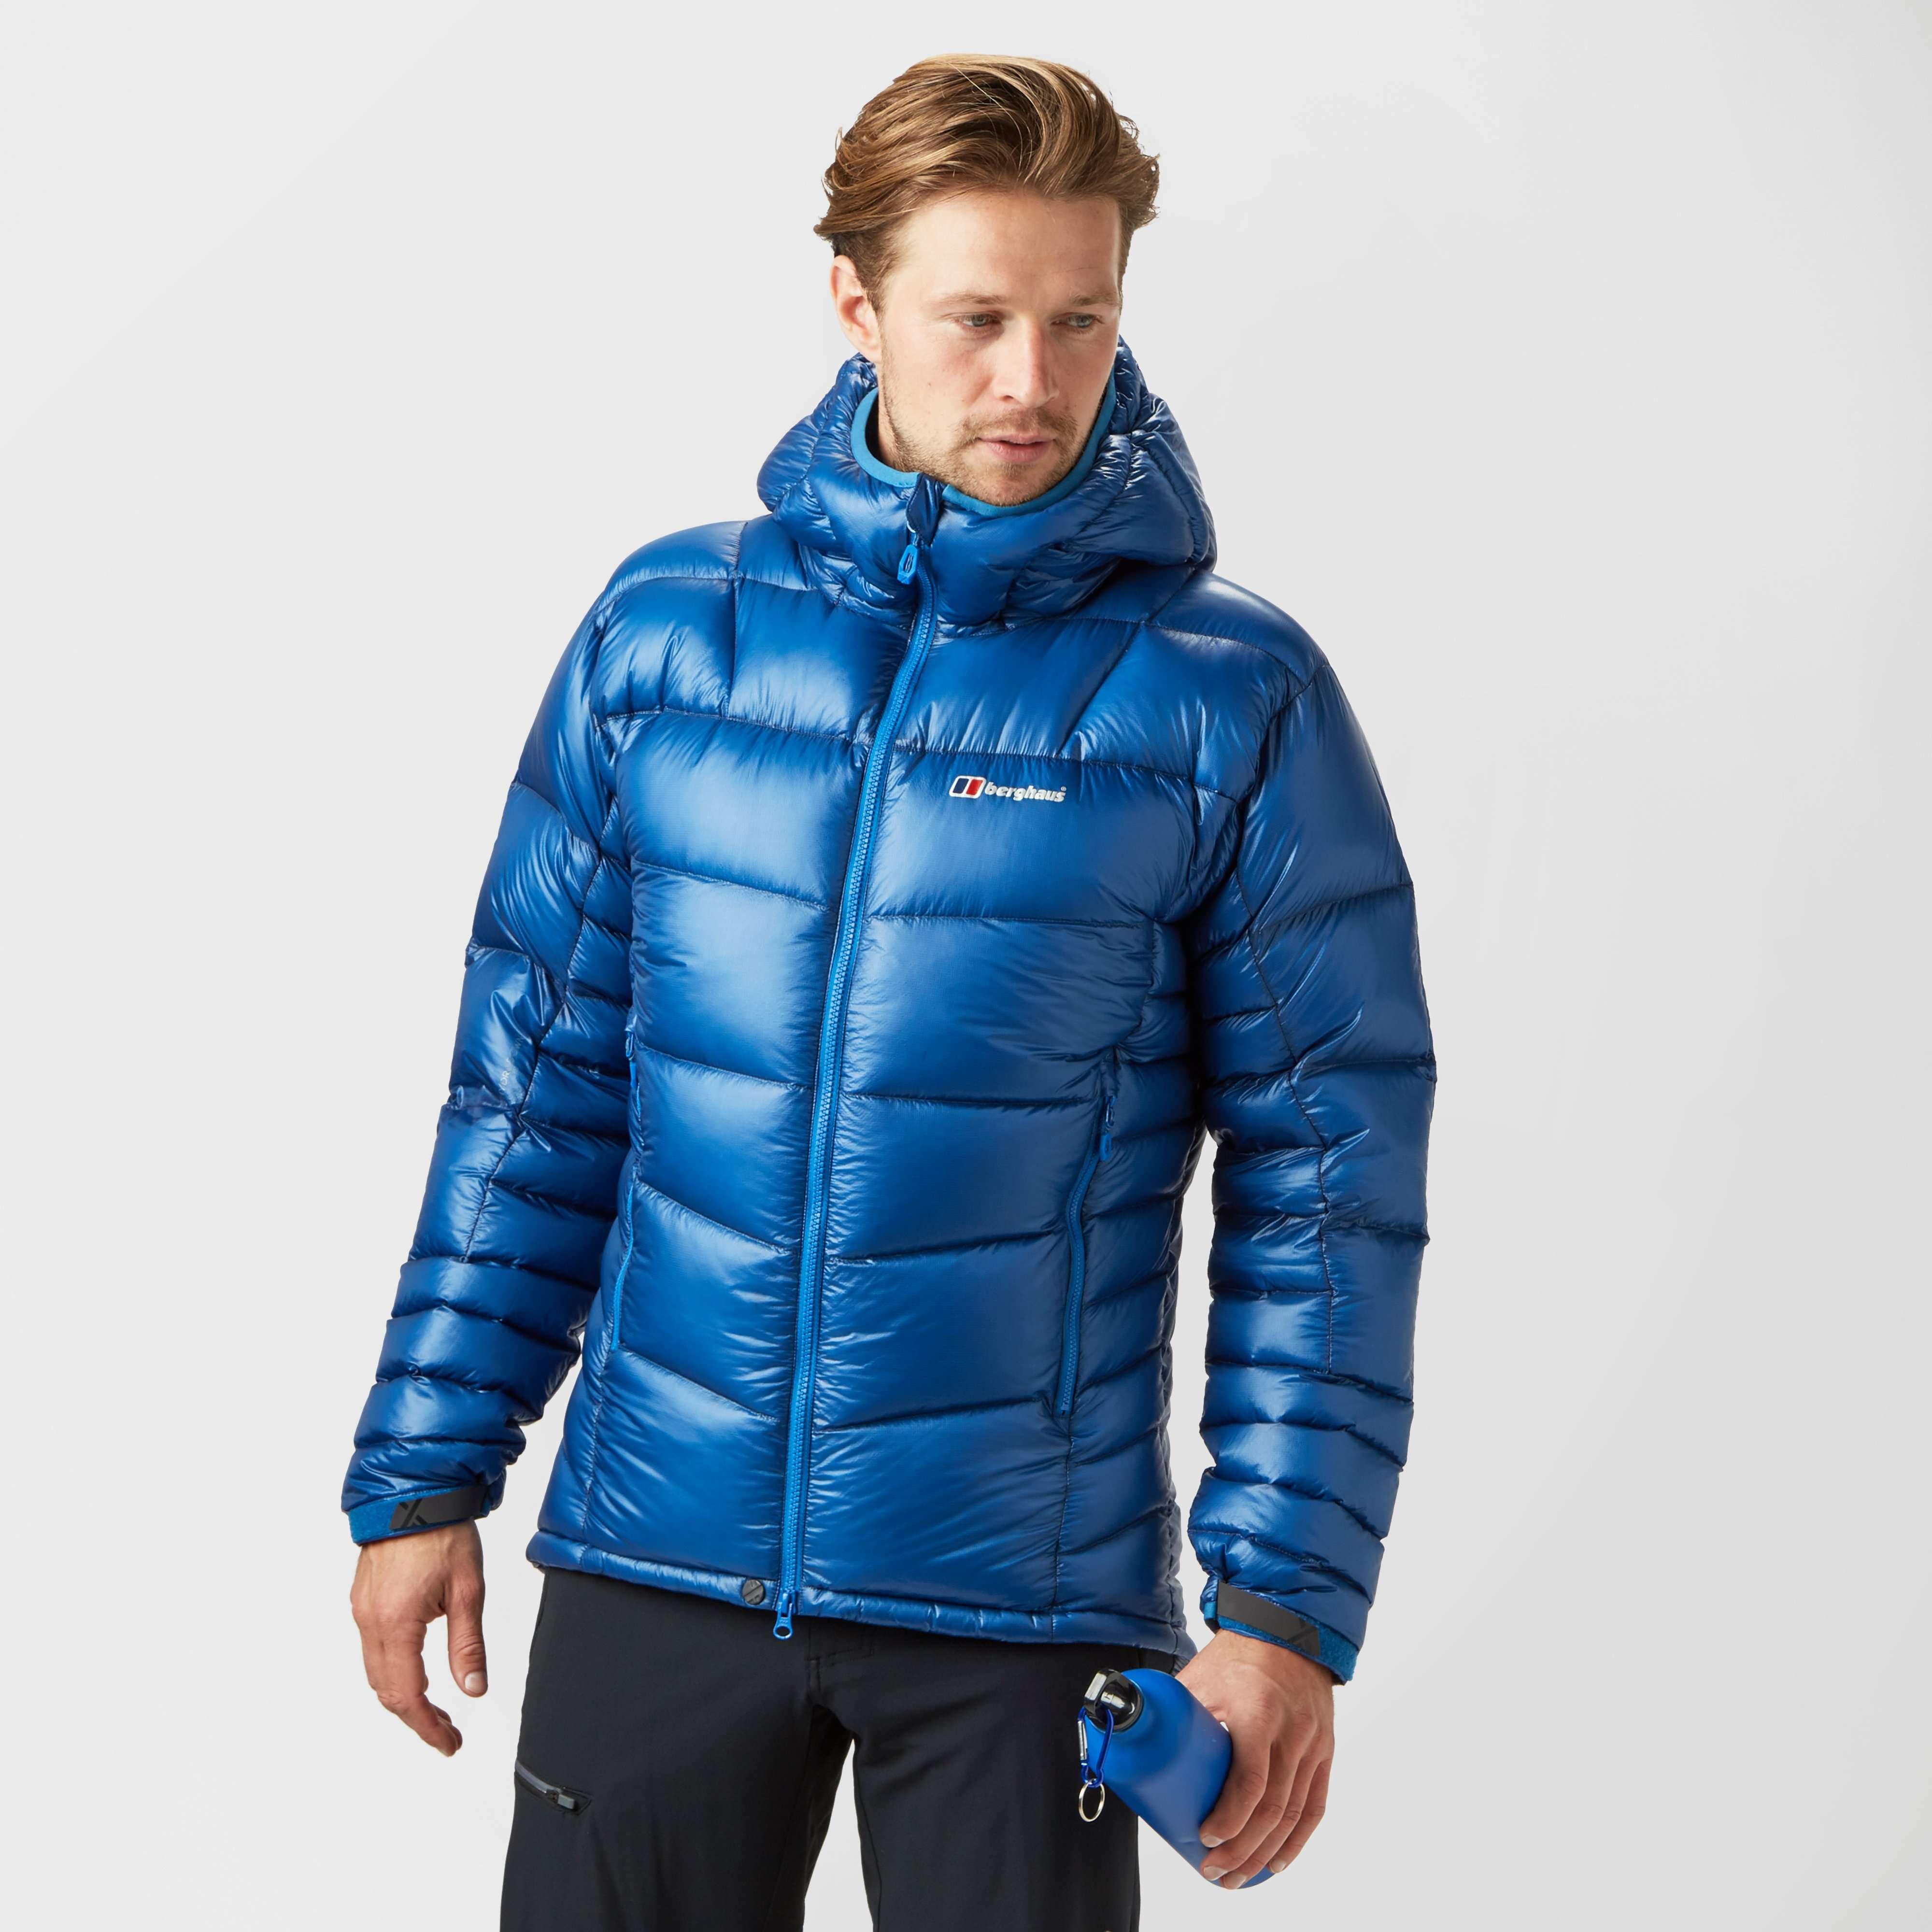 BERGHAUS Men's Extrem Ramche 2.0 Down Jacket